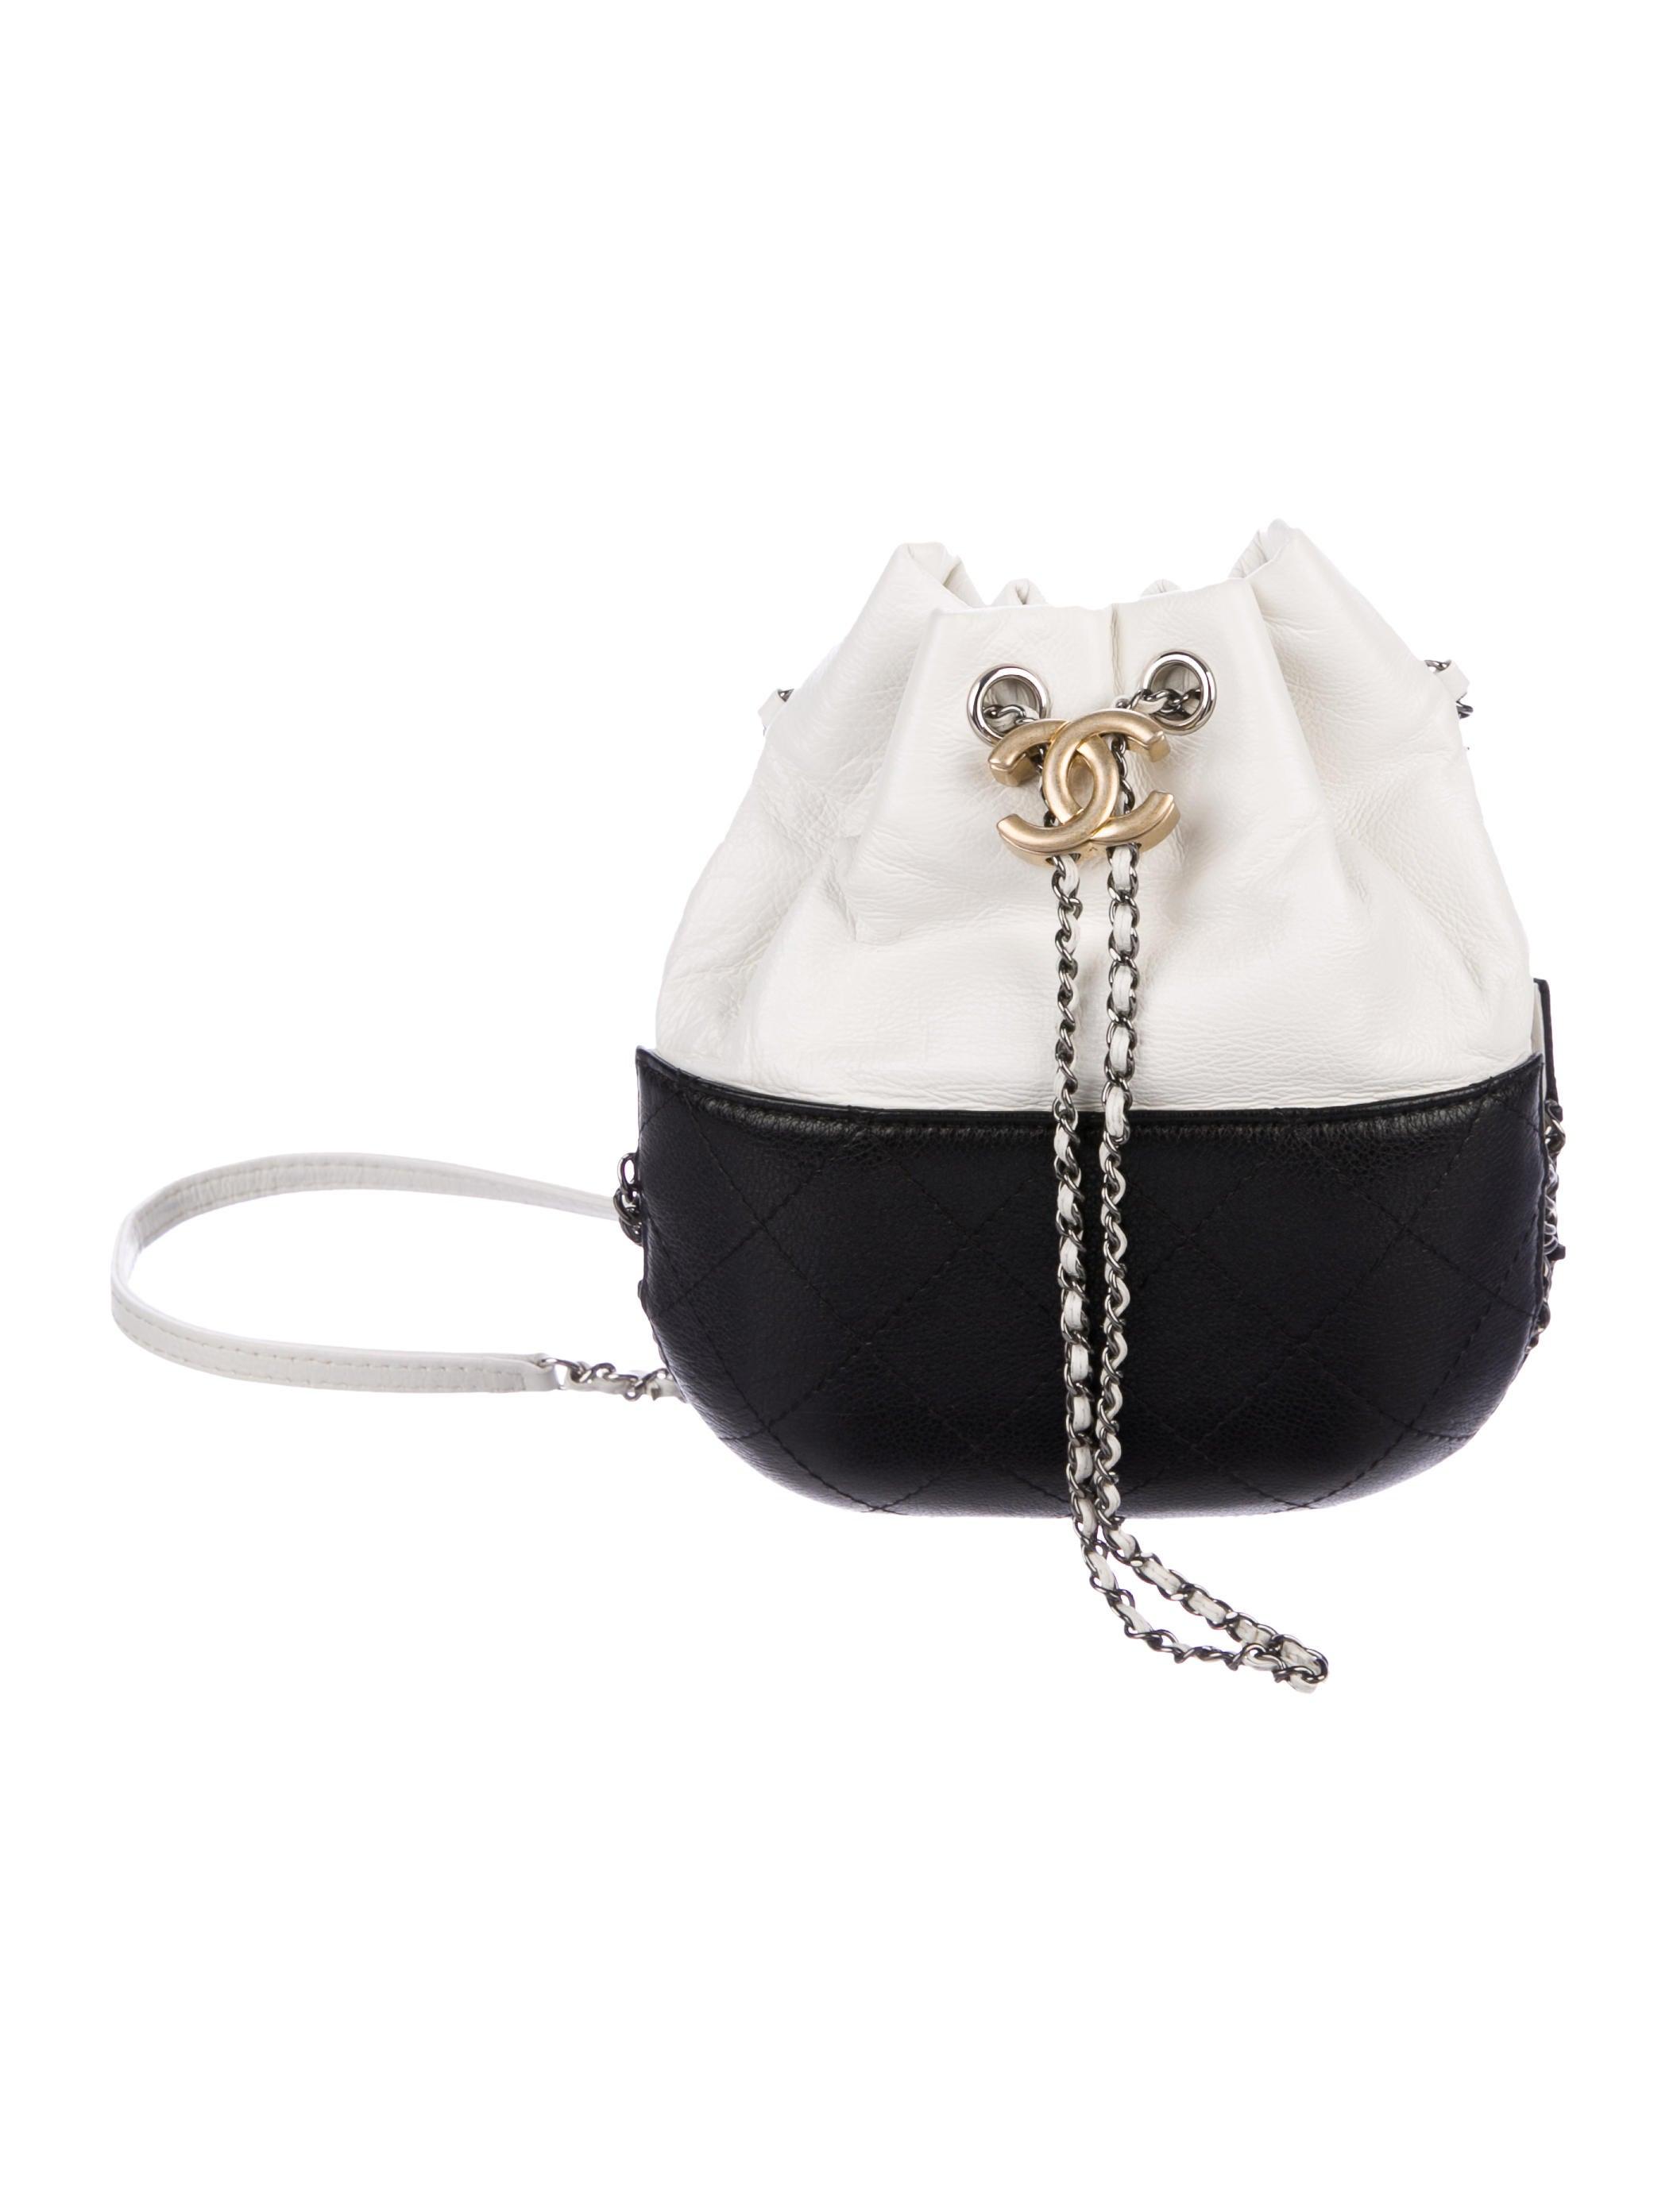 0d5a8262909c Chanel 2017 Small Gabrielle Bucket Bag - Handbags - CHA258544